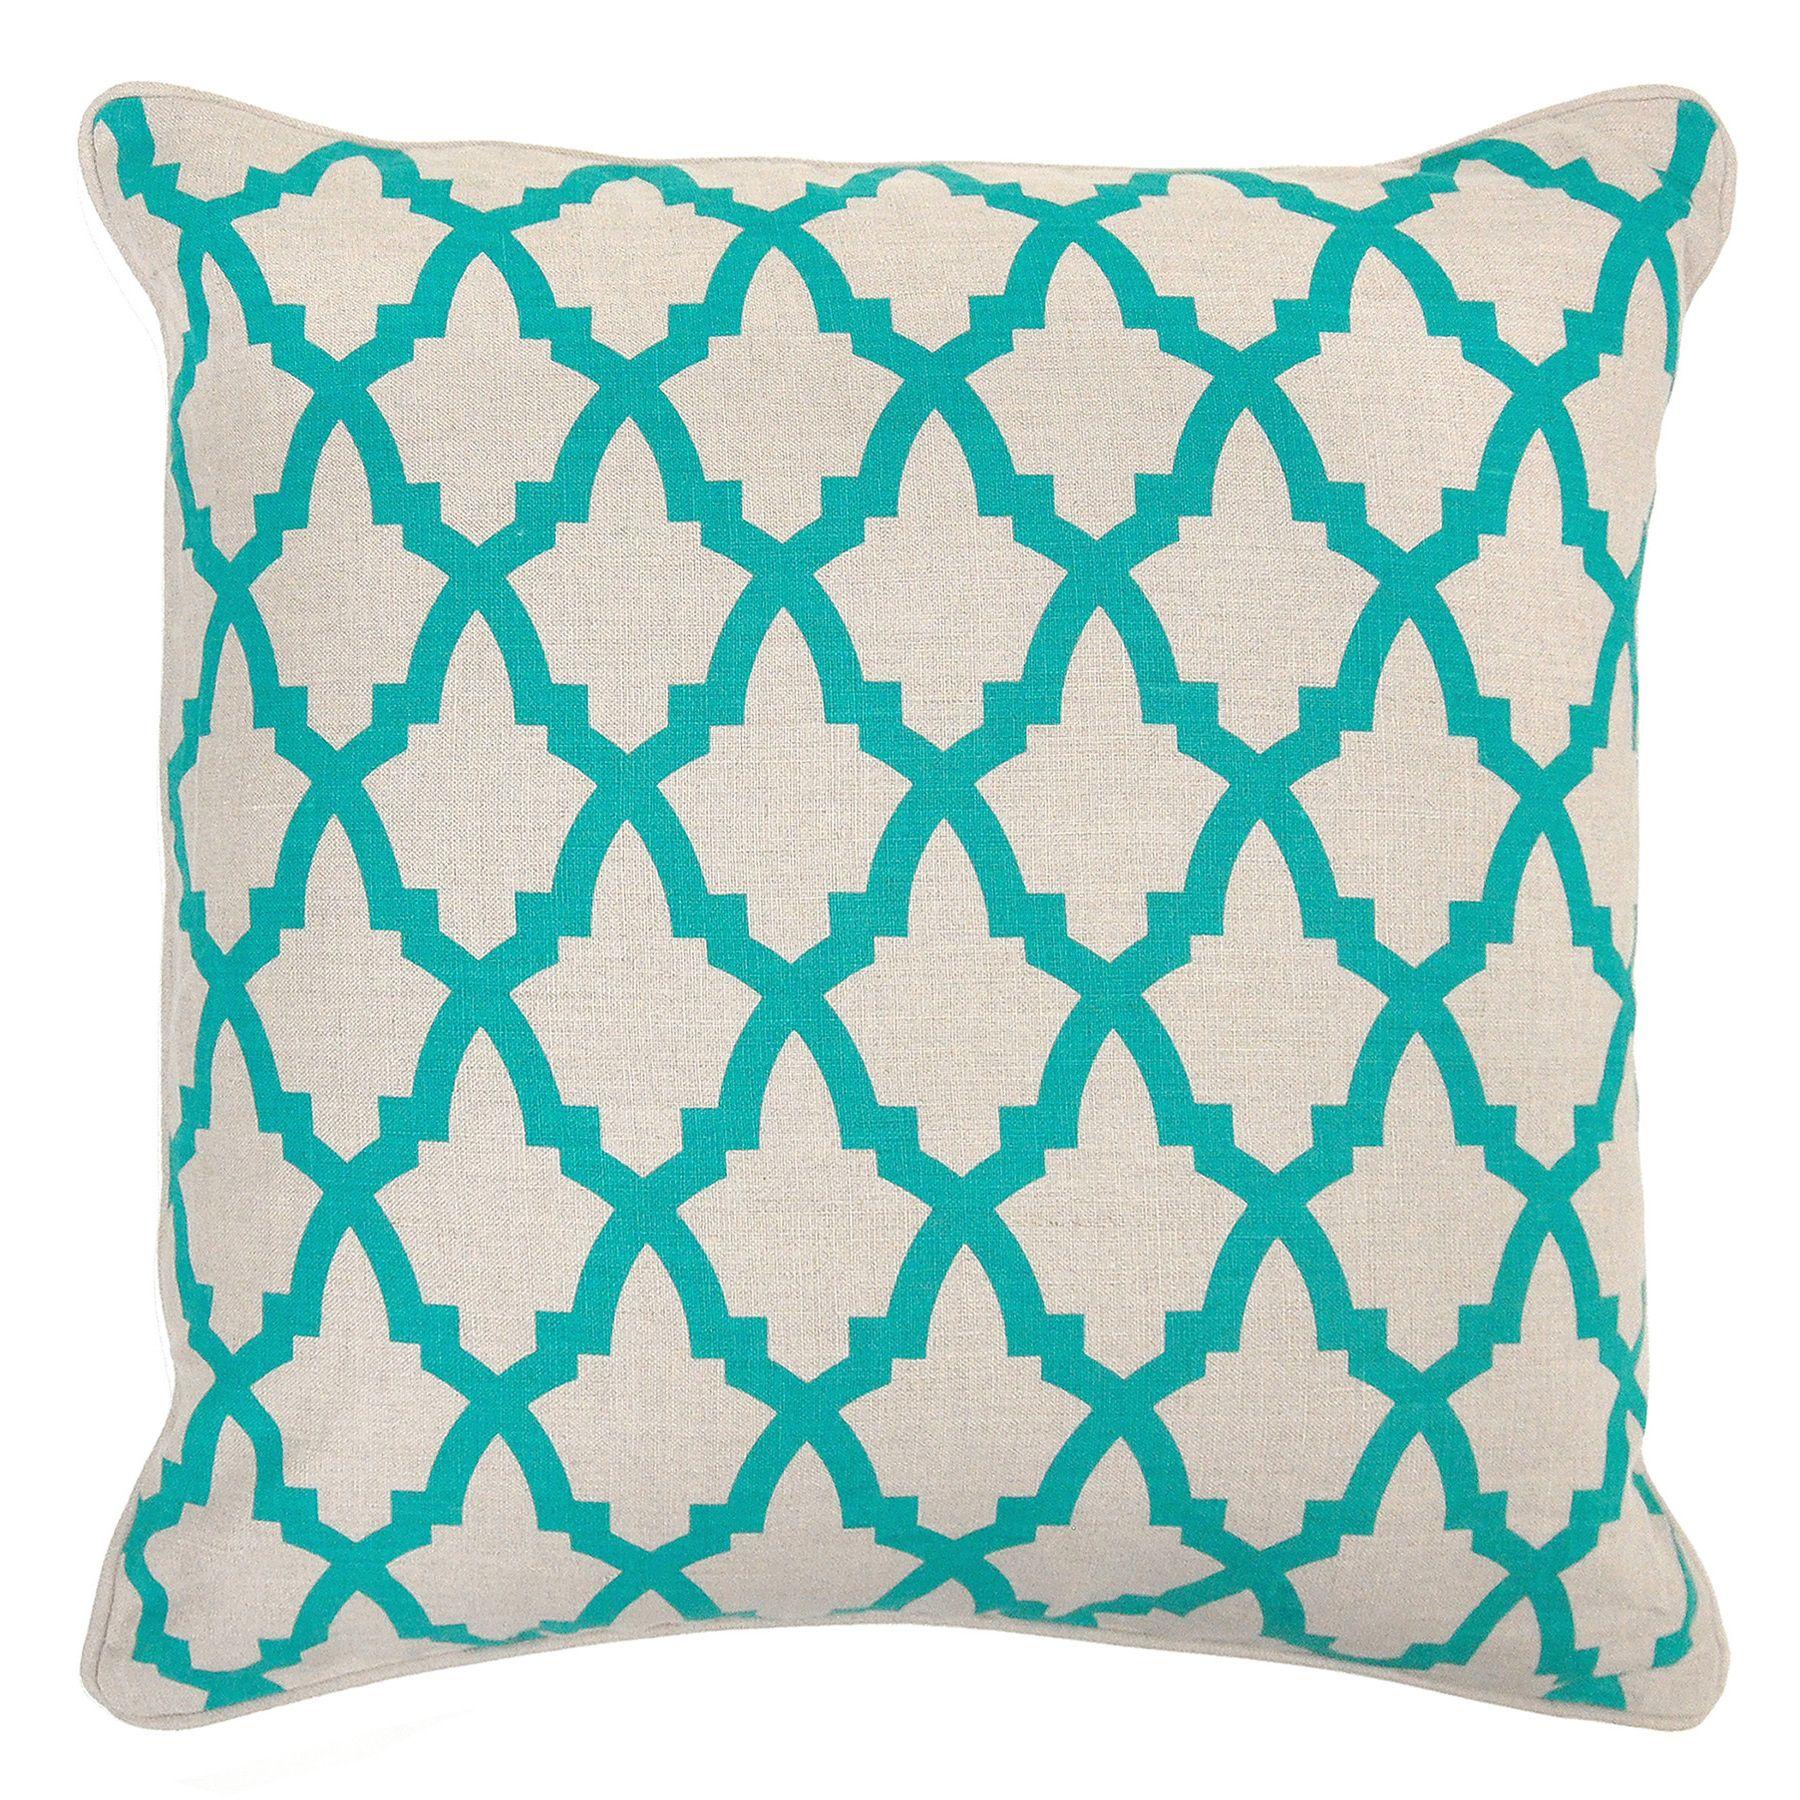 Kosas Collections Valencia Turquoise 22-inch Throw Pillow